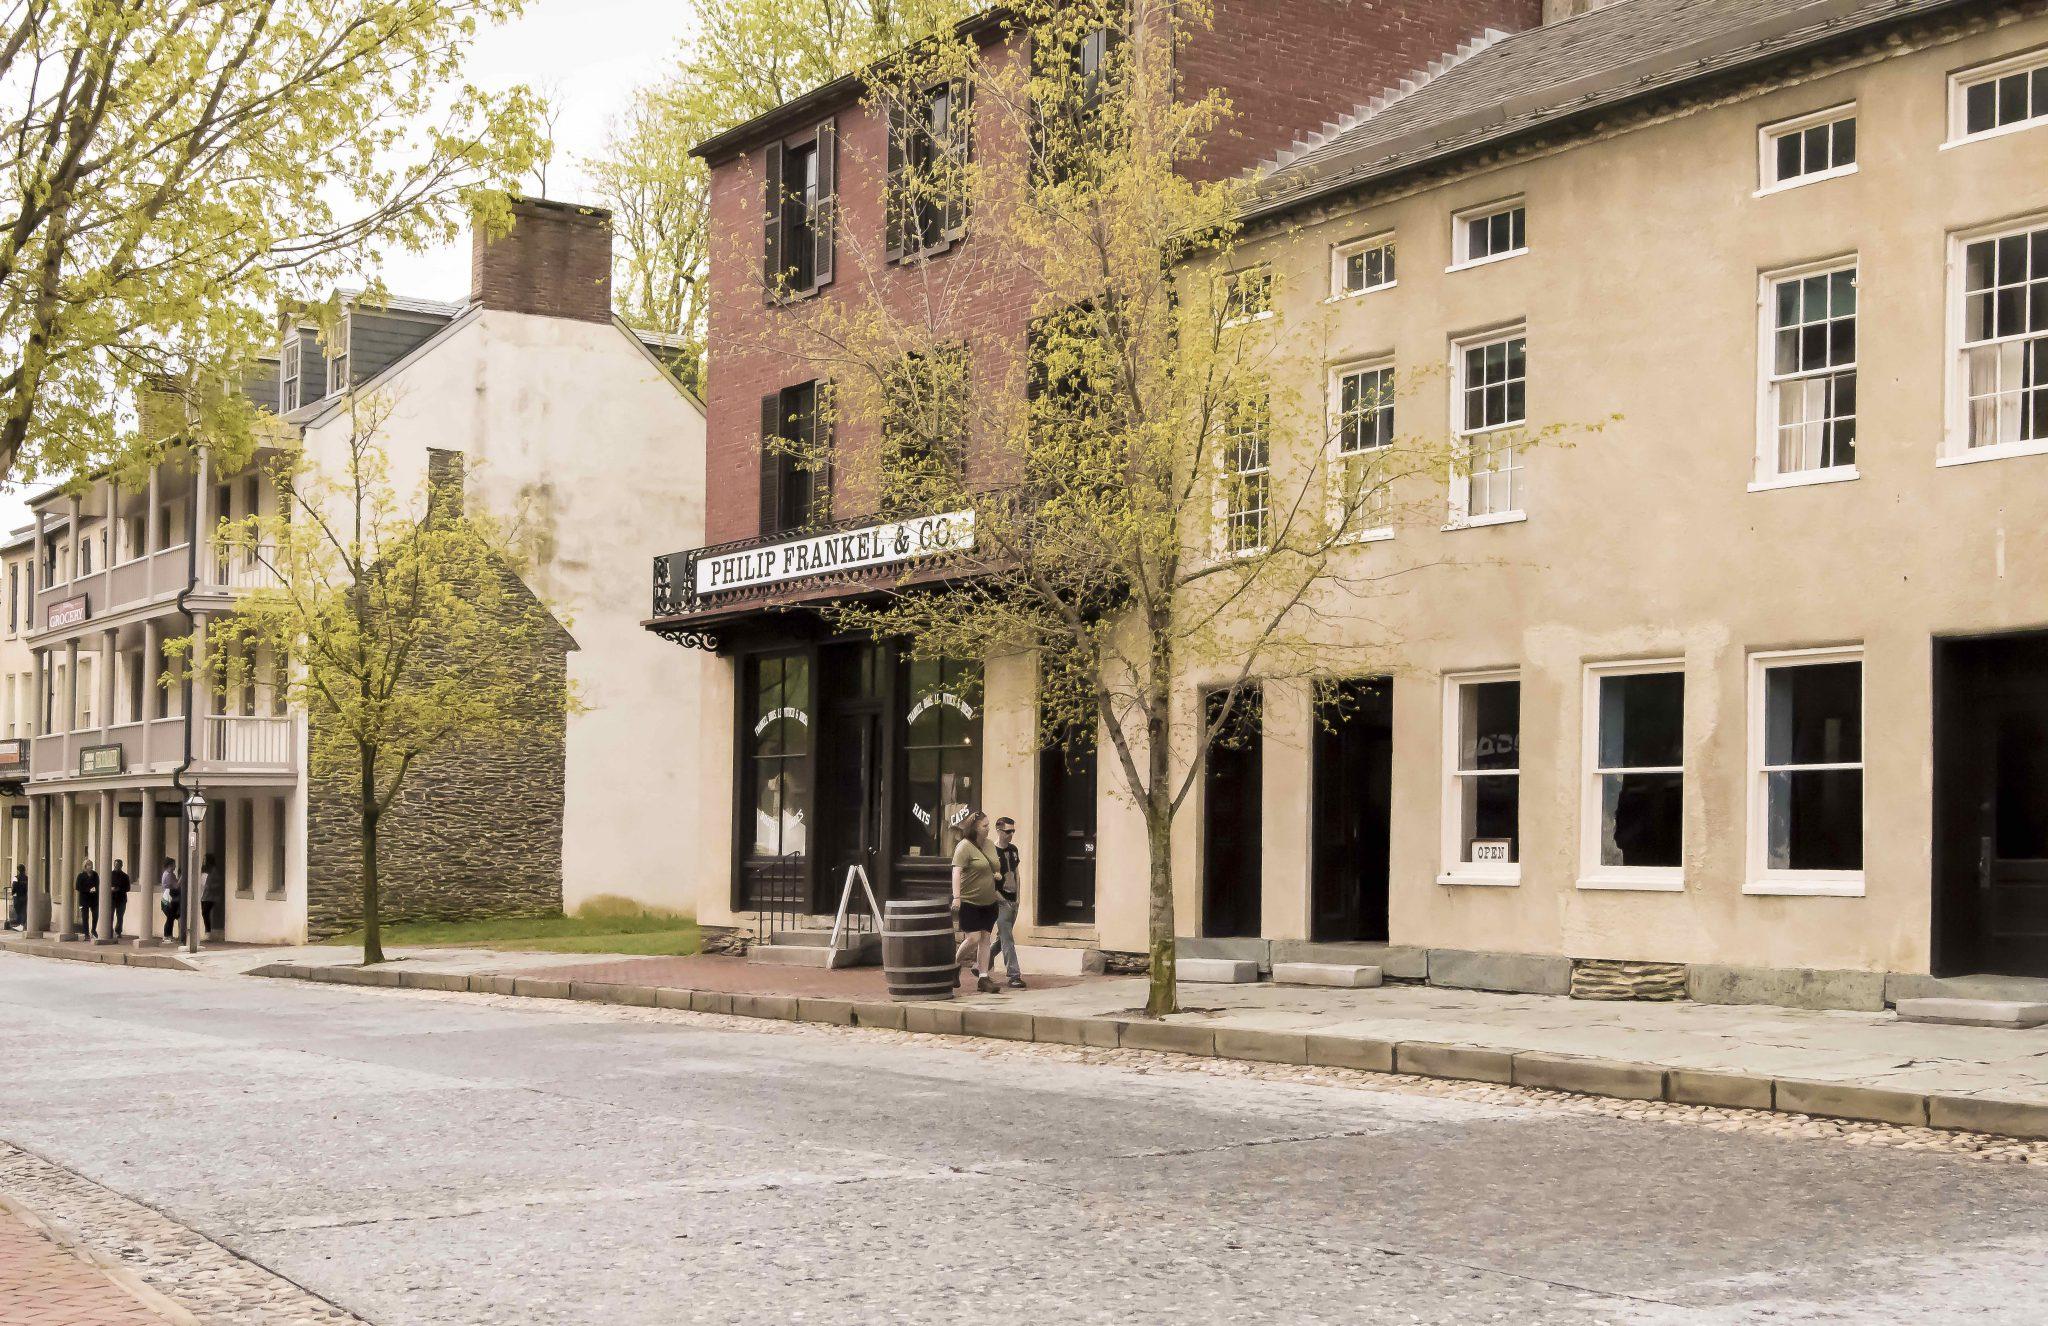 Harpers Ferry: Remembering John Brown